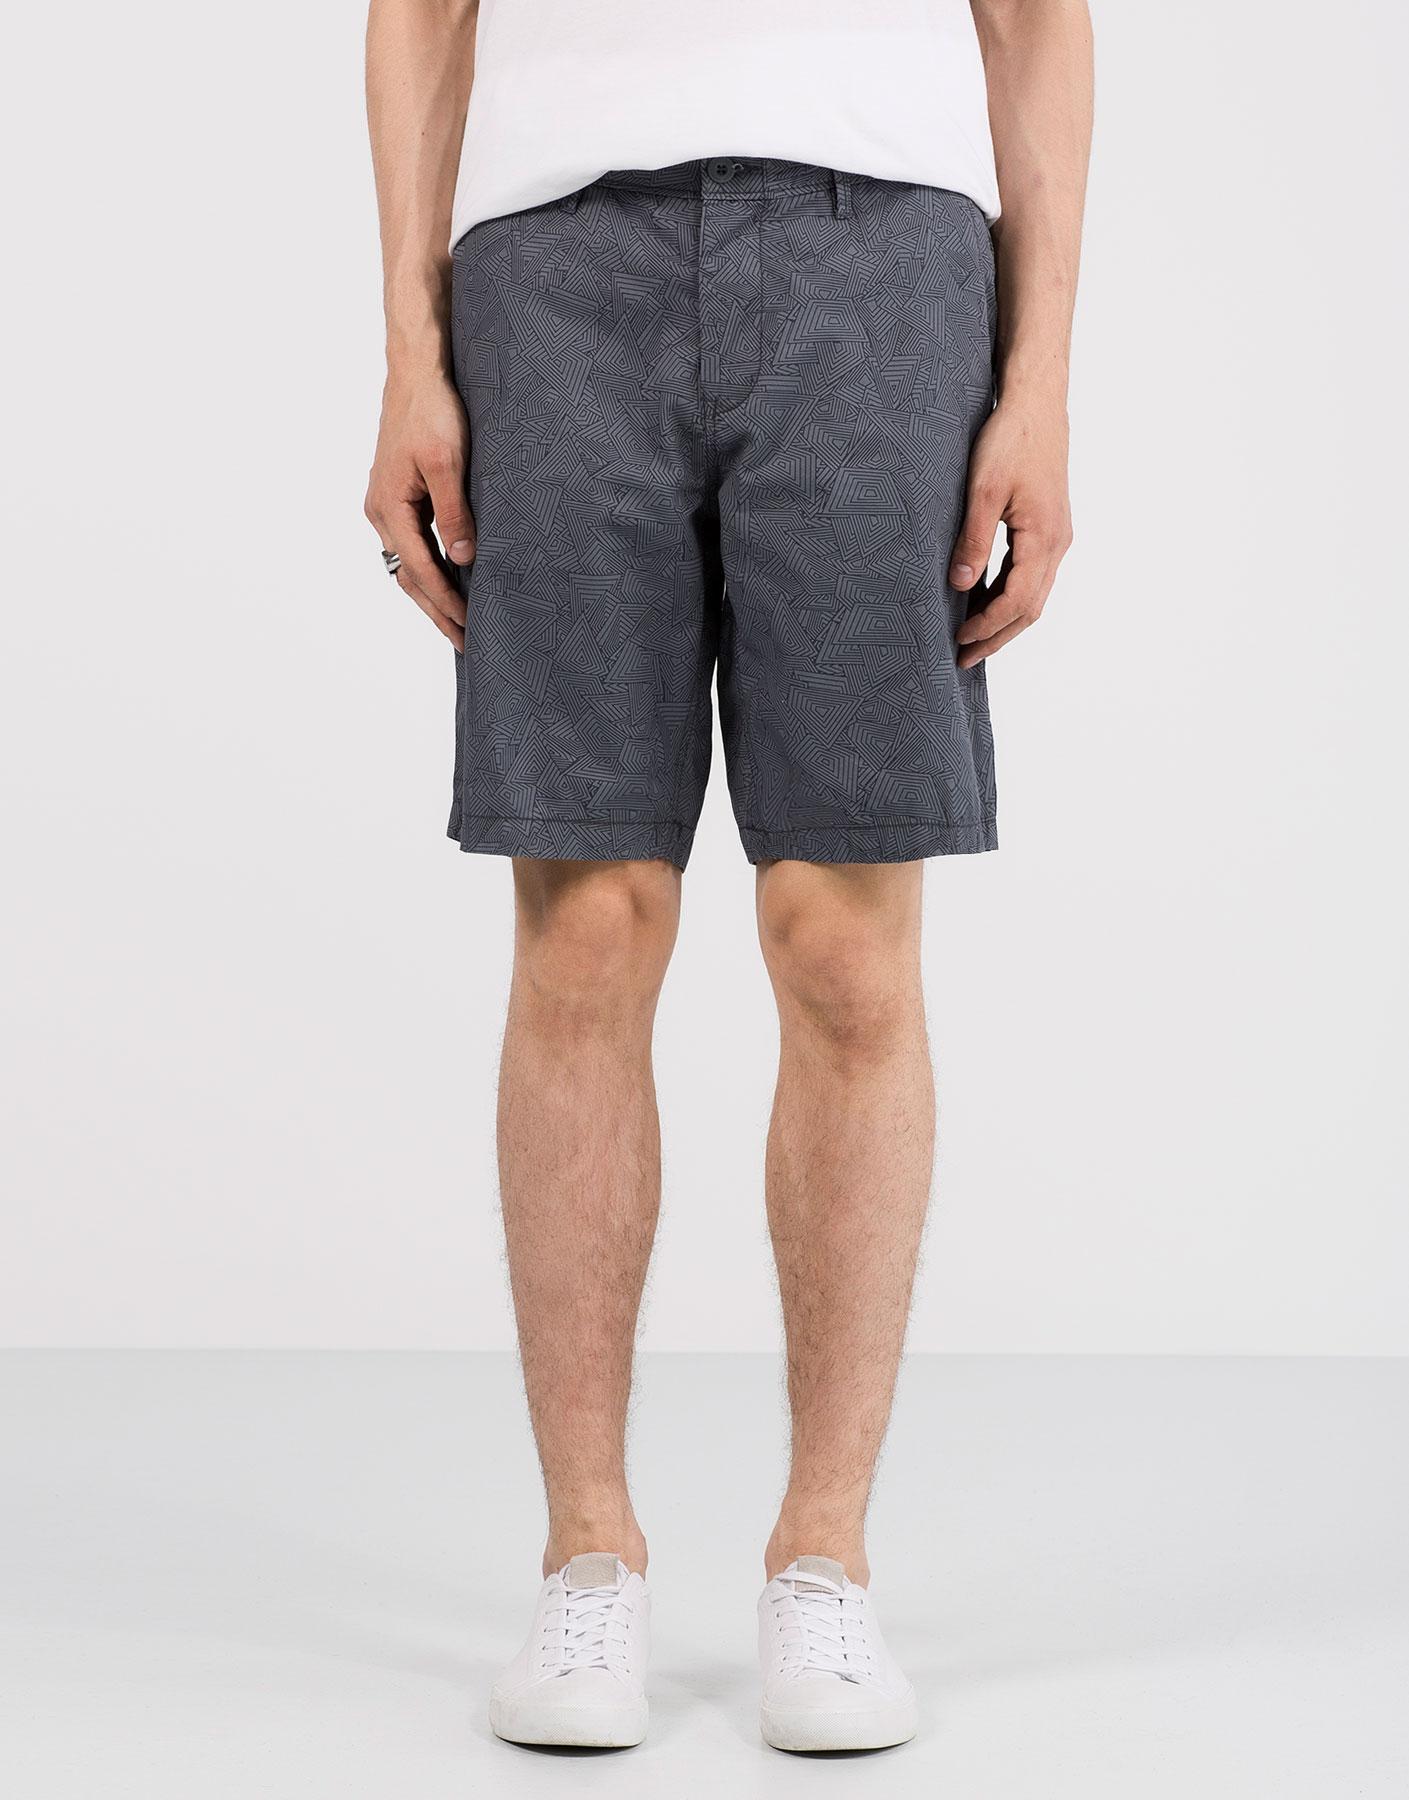 Light chino-style bermuda shorts